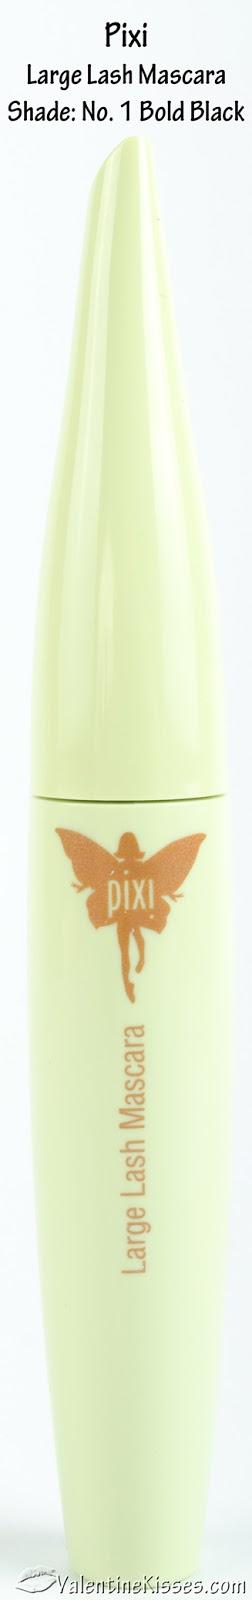 Pixi By Petra Large Lash Mascara Bold Black - 0.25oz